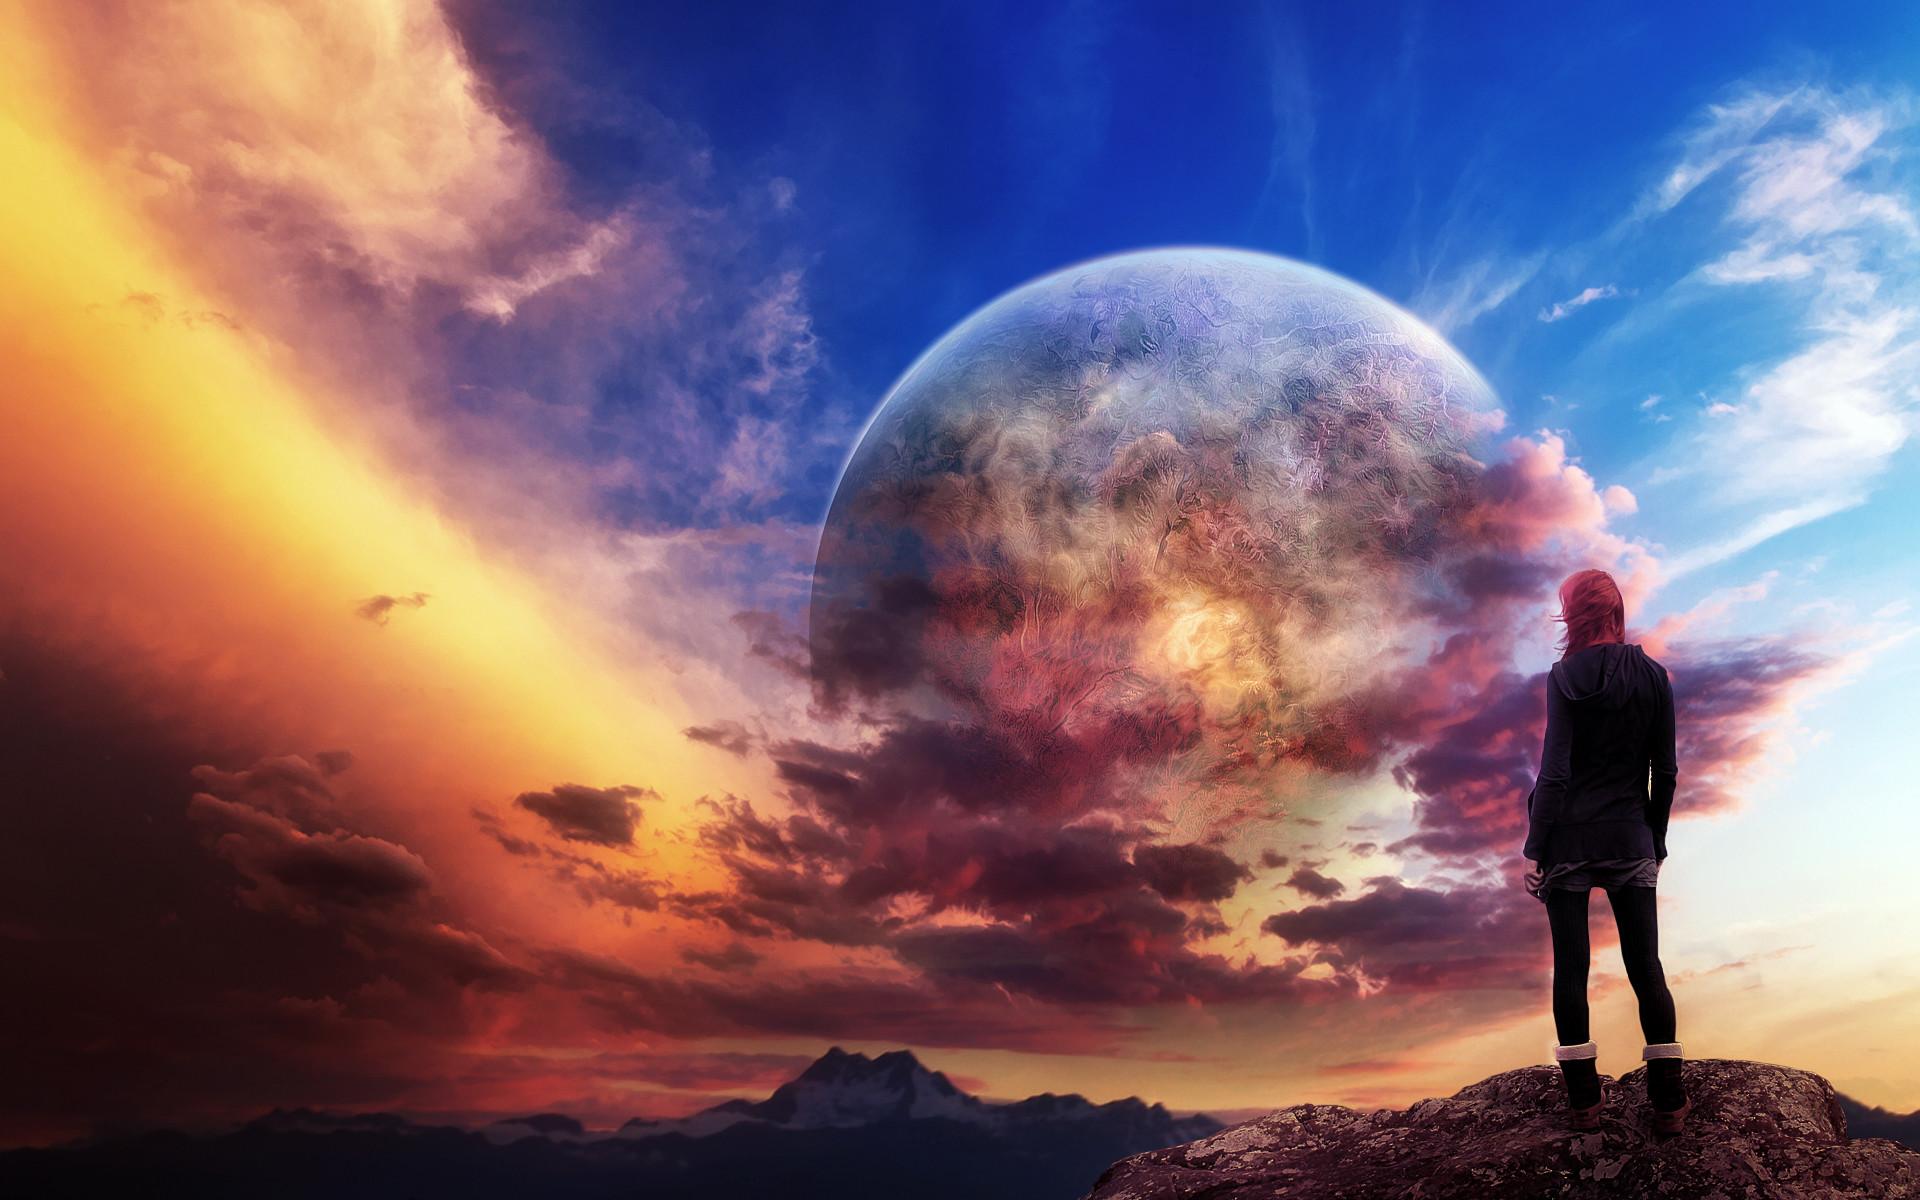 Fantasy dream sci fi Landscapes   Planet Redhead Clouds cgi digital art sci-fi  landscapes